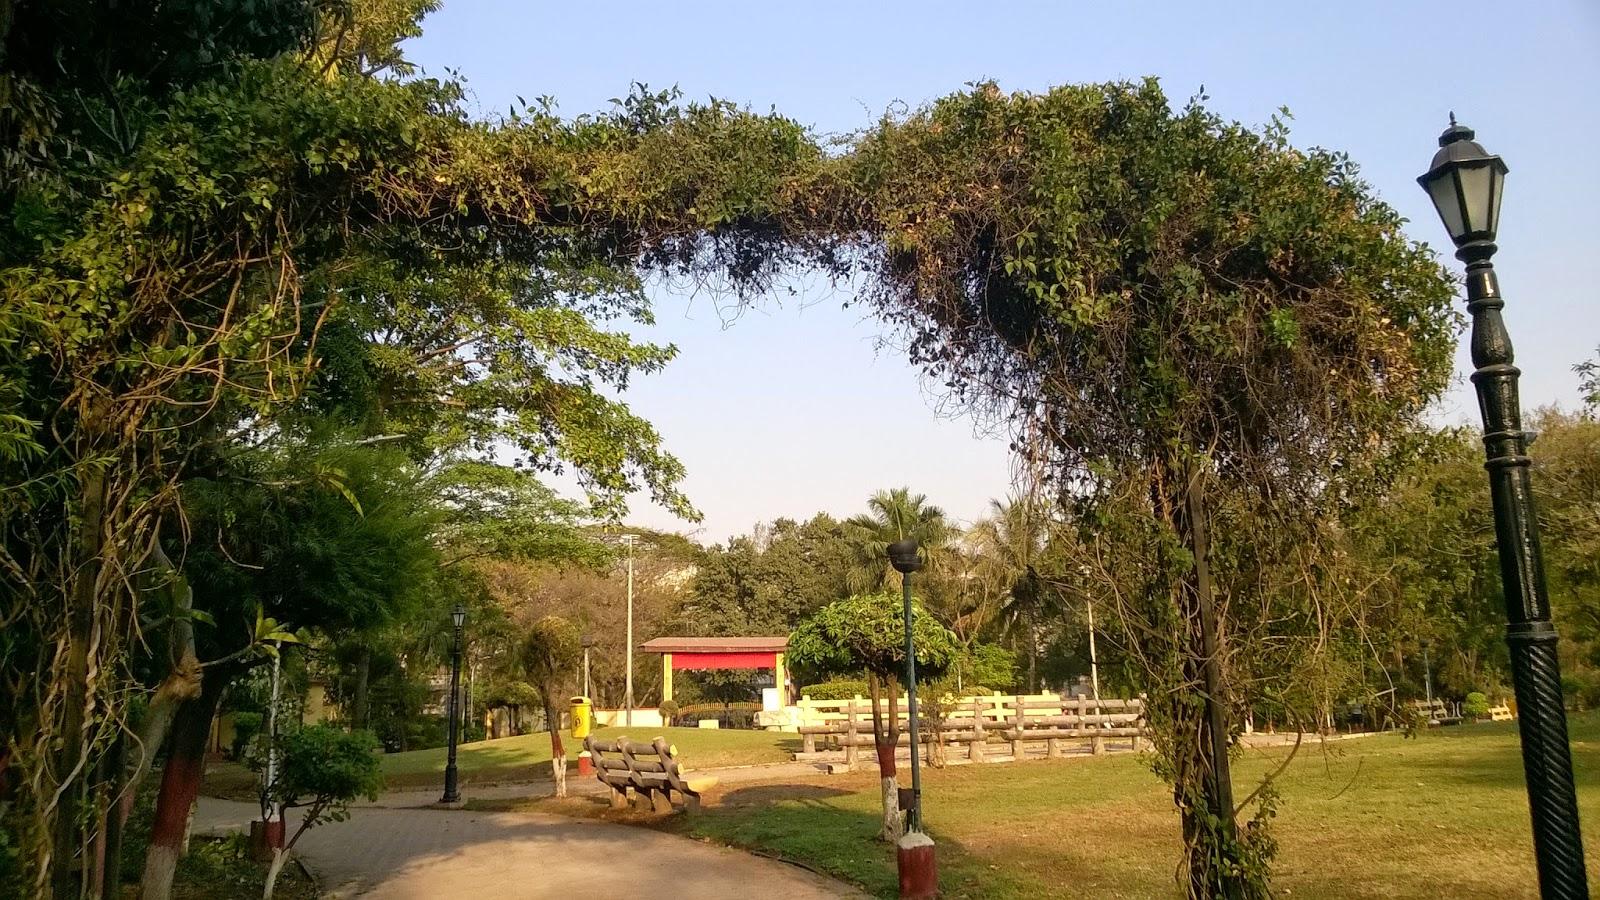 Parks, gardens, pune